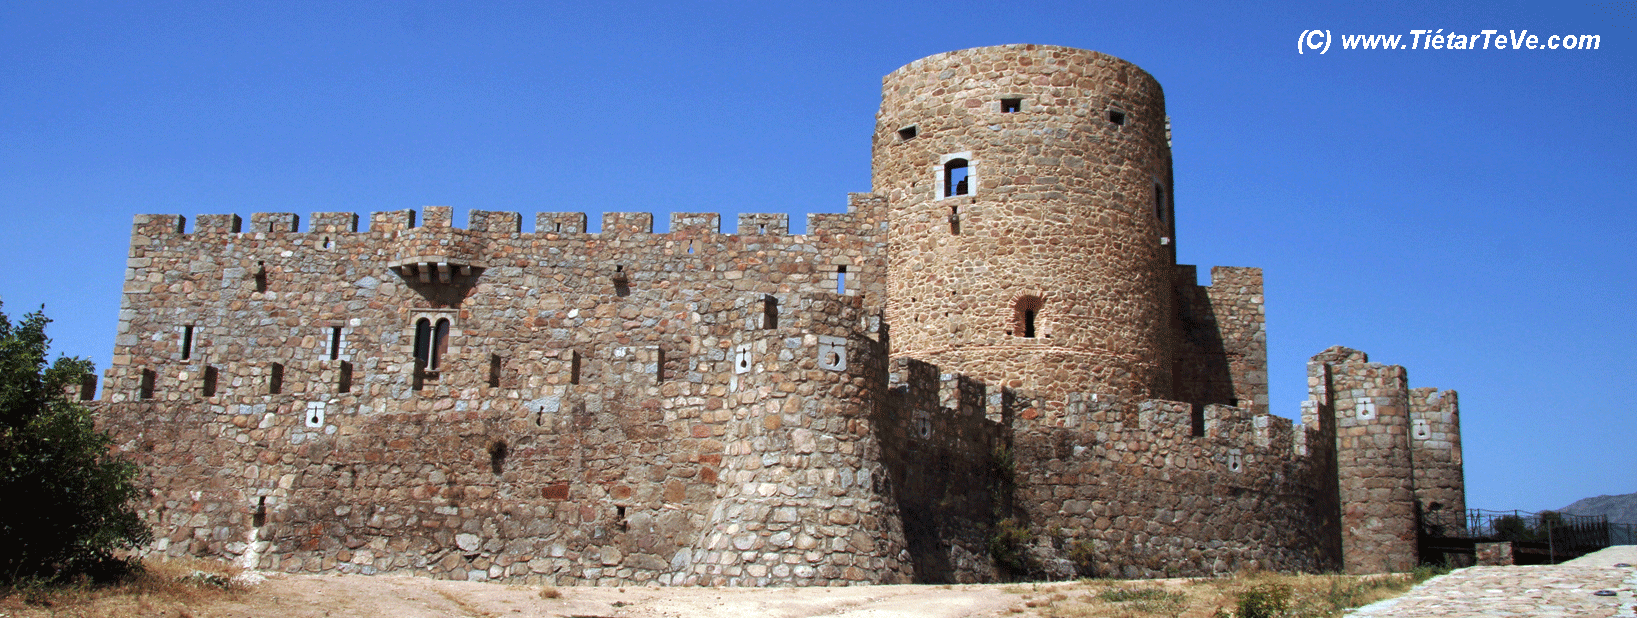 Bienes de Interés Cultural - Castillo de La Adrada